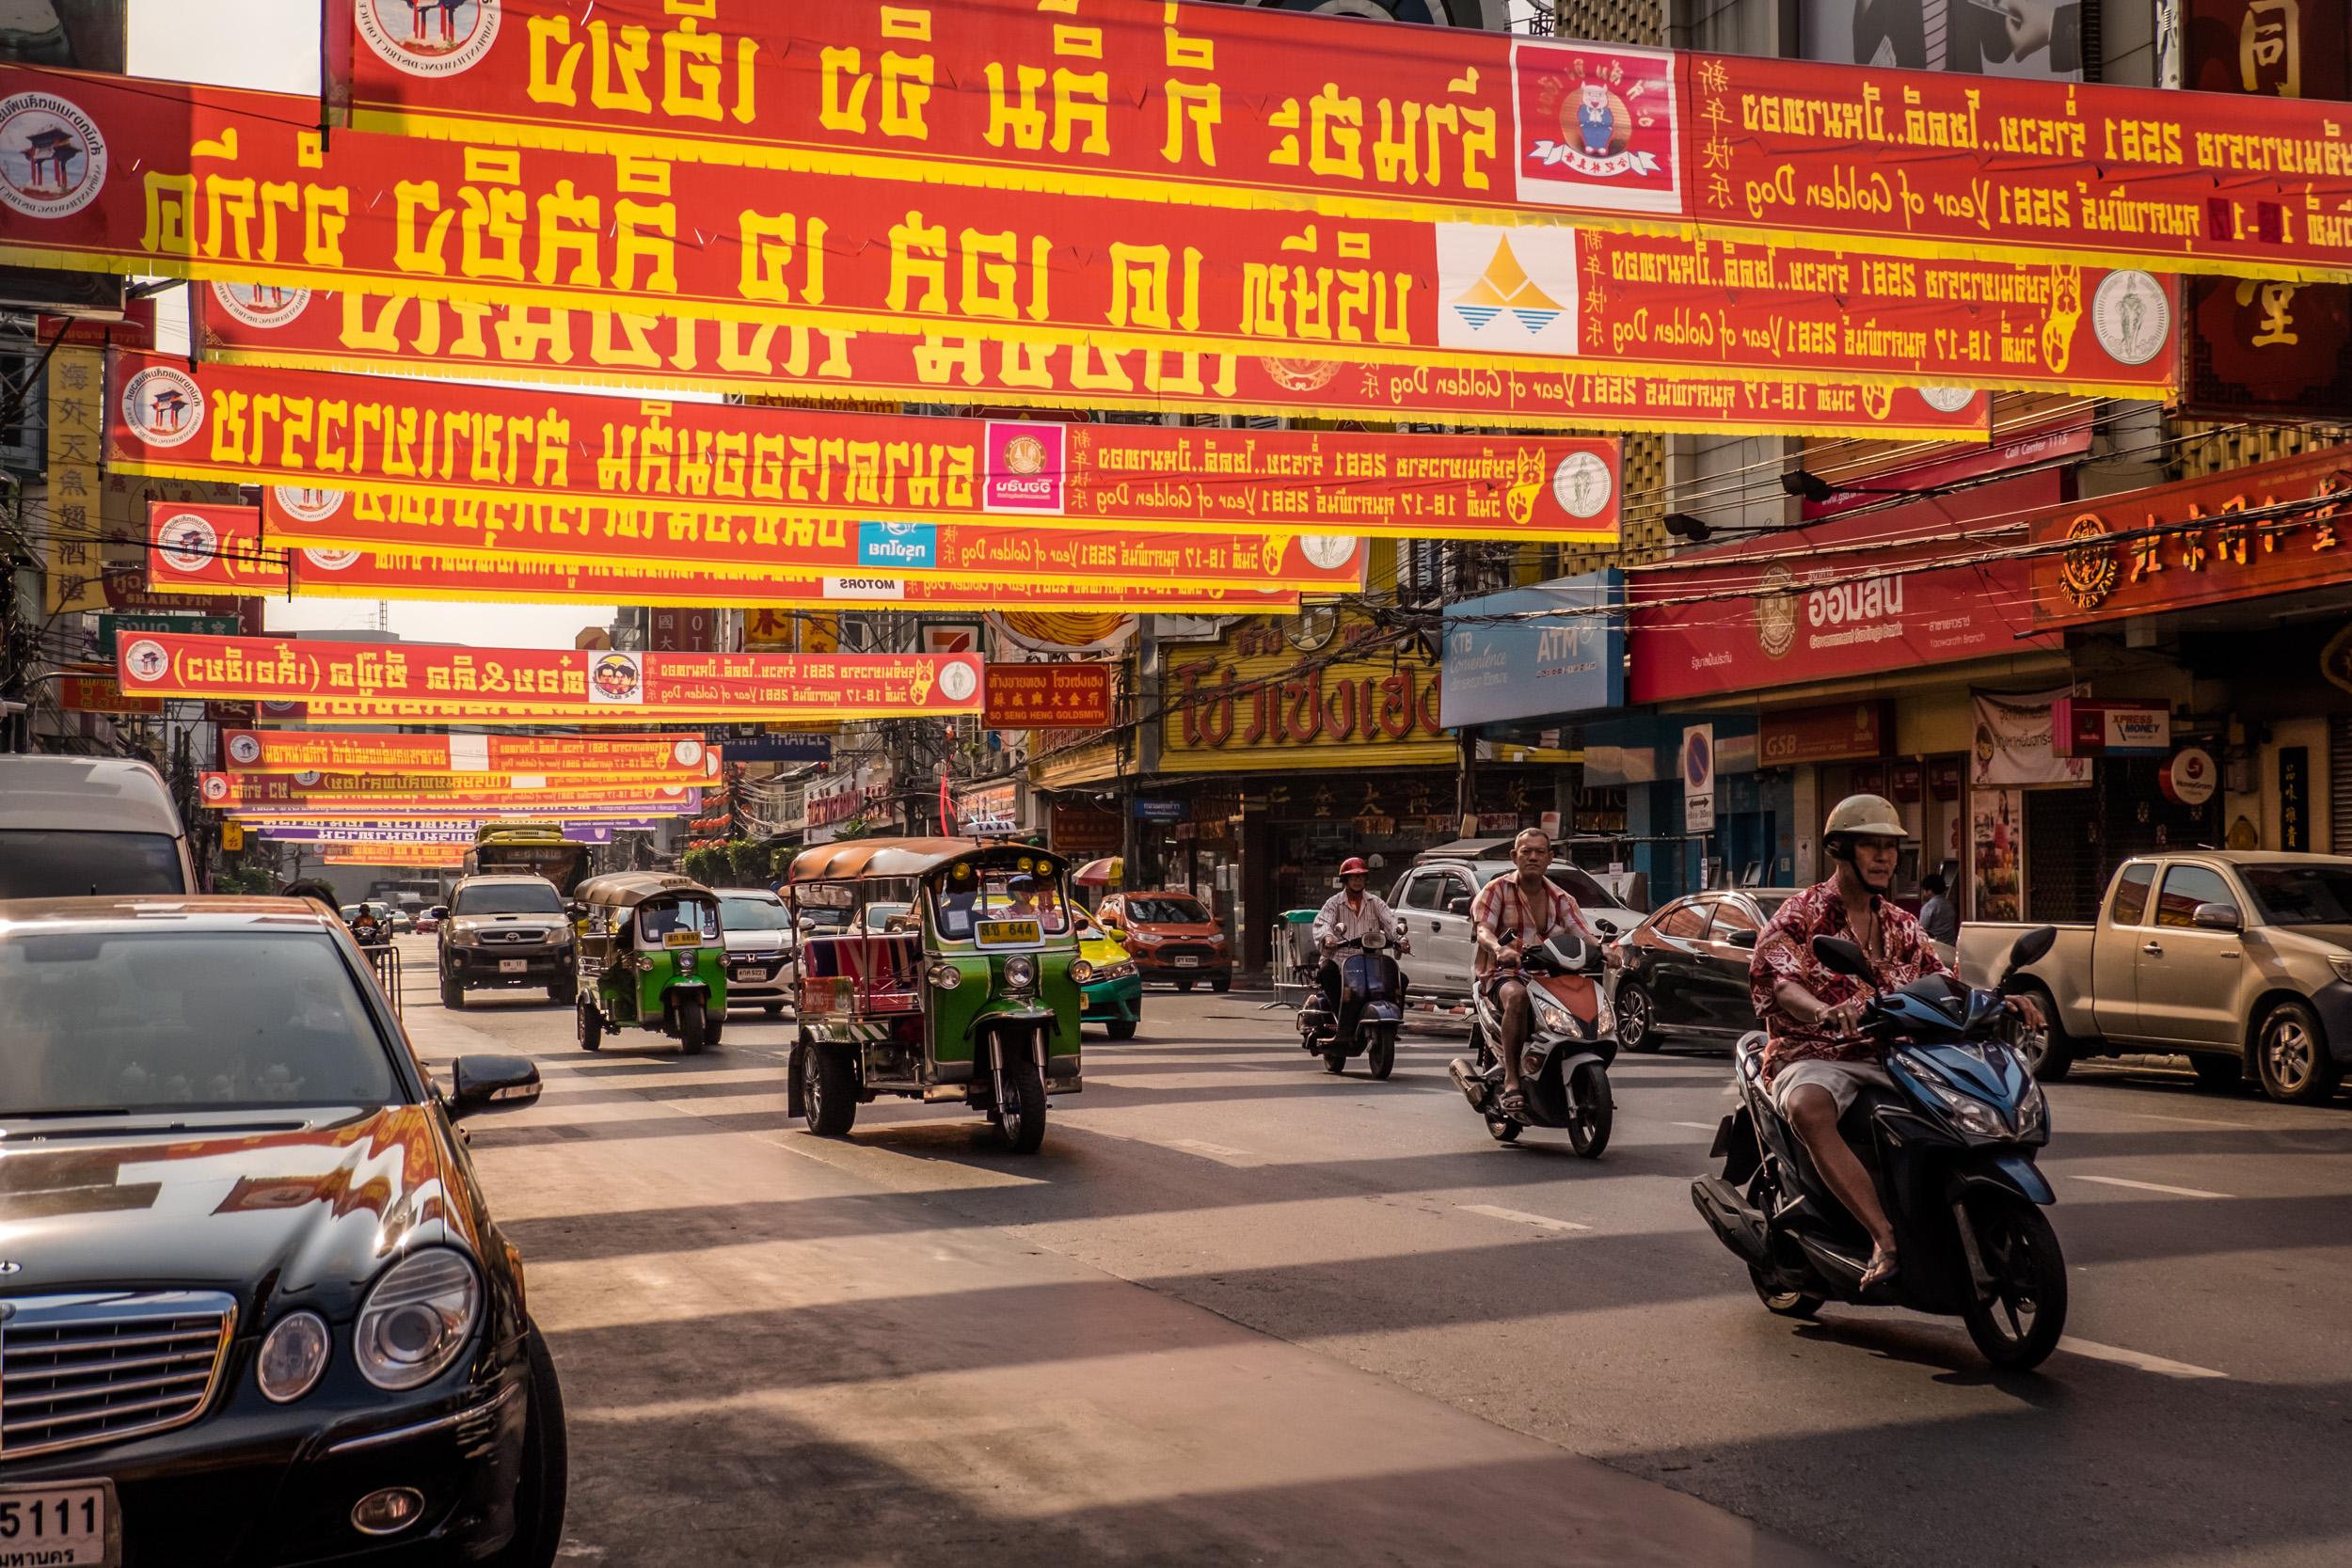 Tuk Tuk's in Chinatown